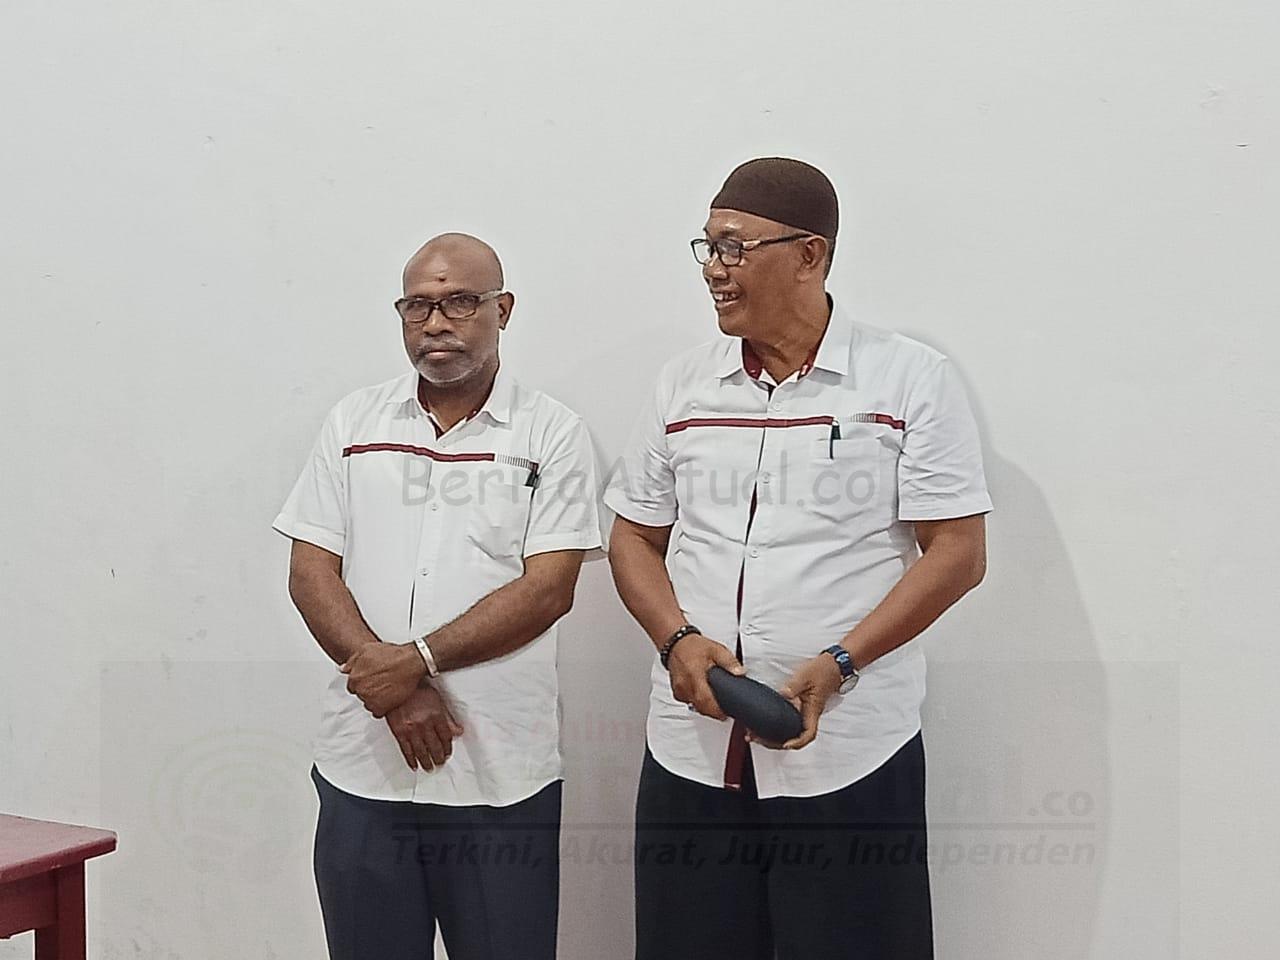 Saat Daftar di KPU, Kedatangan Boneftar - Waluyo Akan Disambut Tarian Nusantara 16 IMG 20200903 WA0032